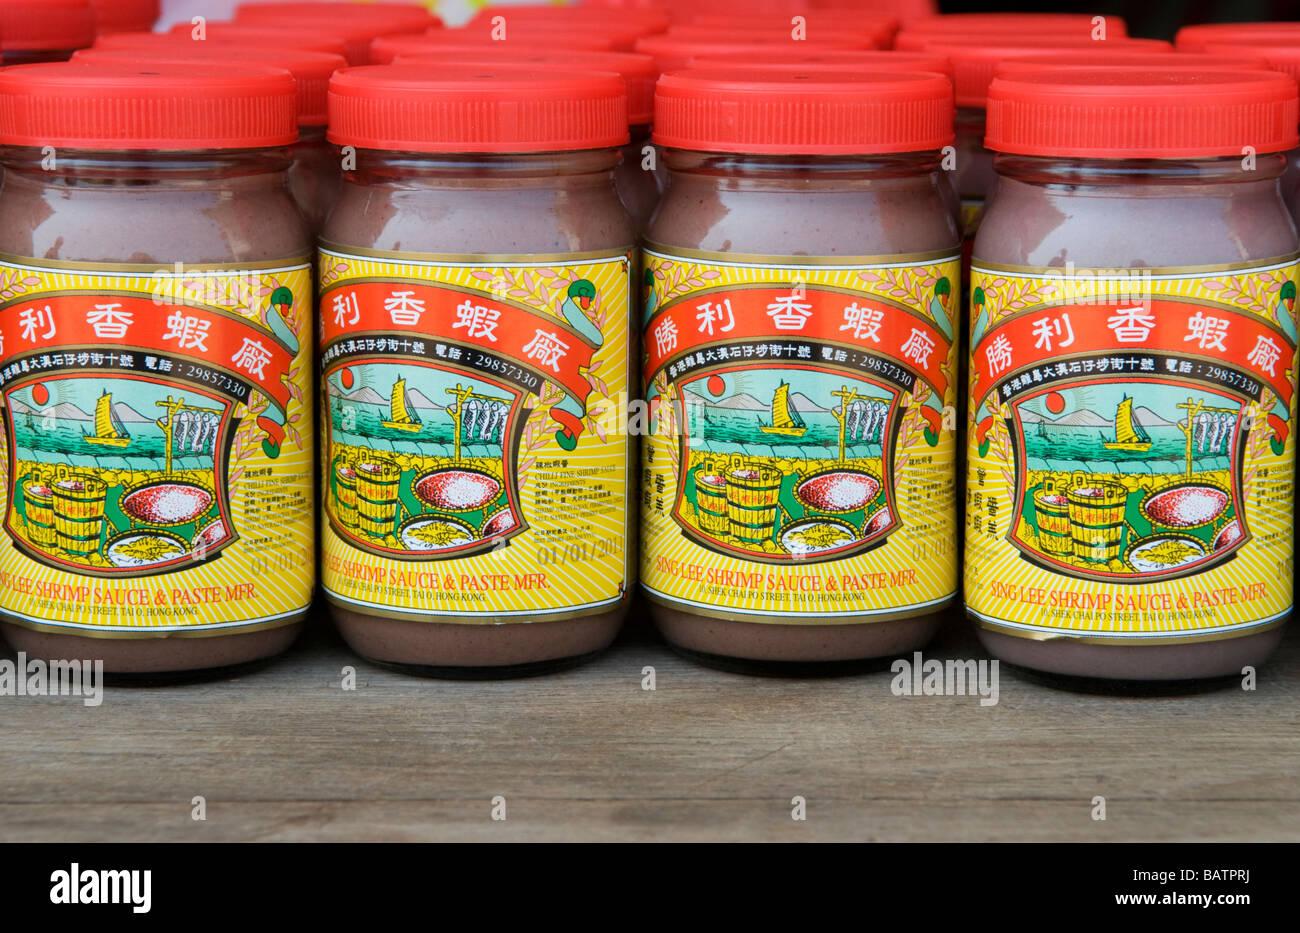 Jars of locally produced shrimp paste at the traditional fishing village of Tai O on Lantau Island Hong Kong. - Stock Image